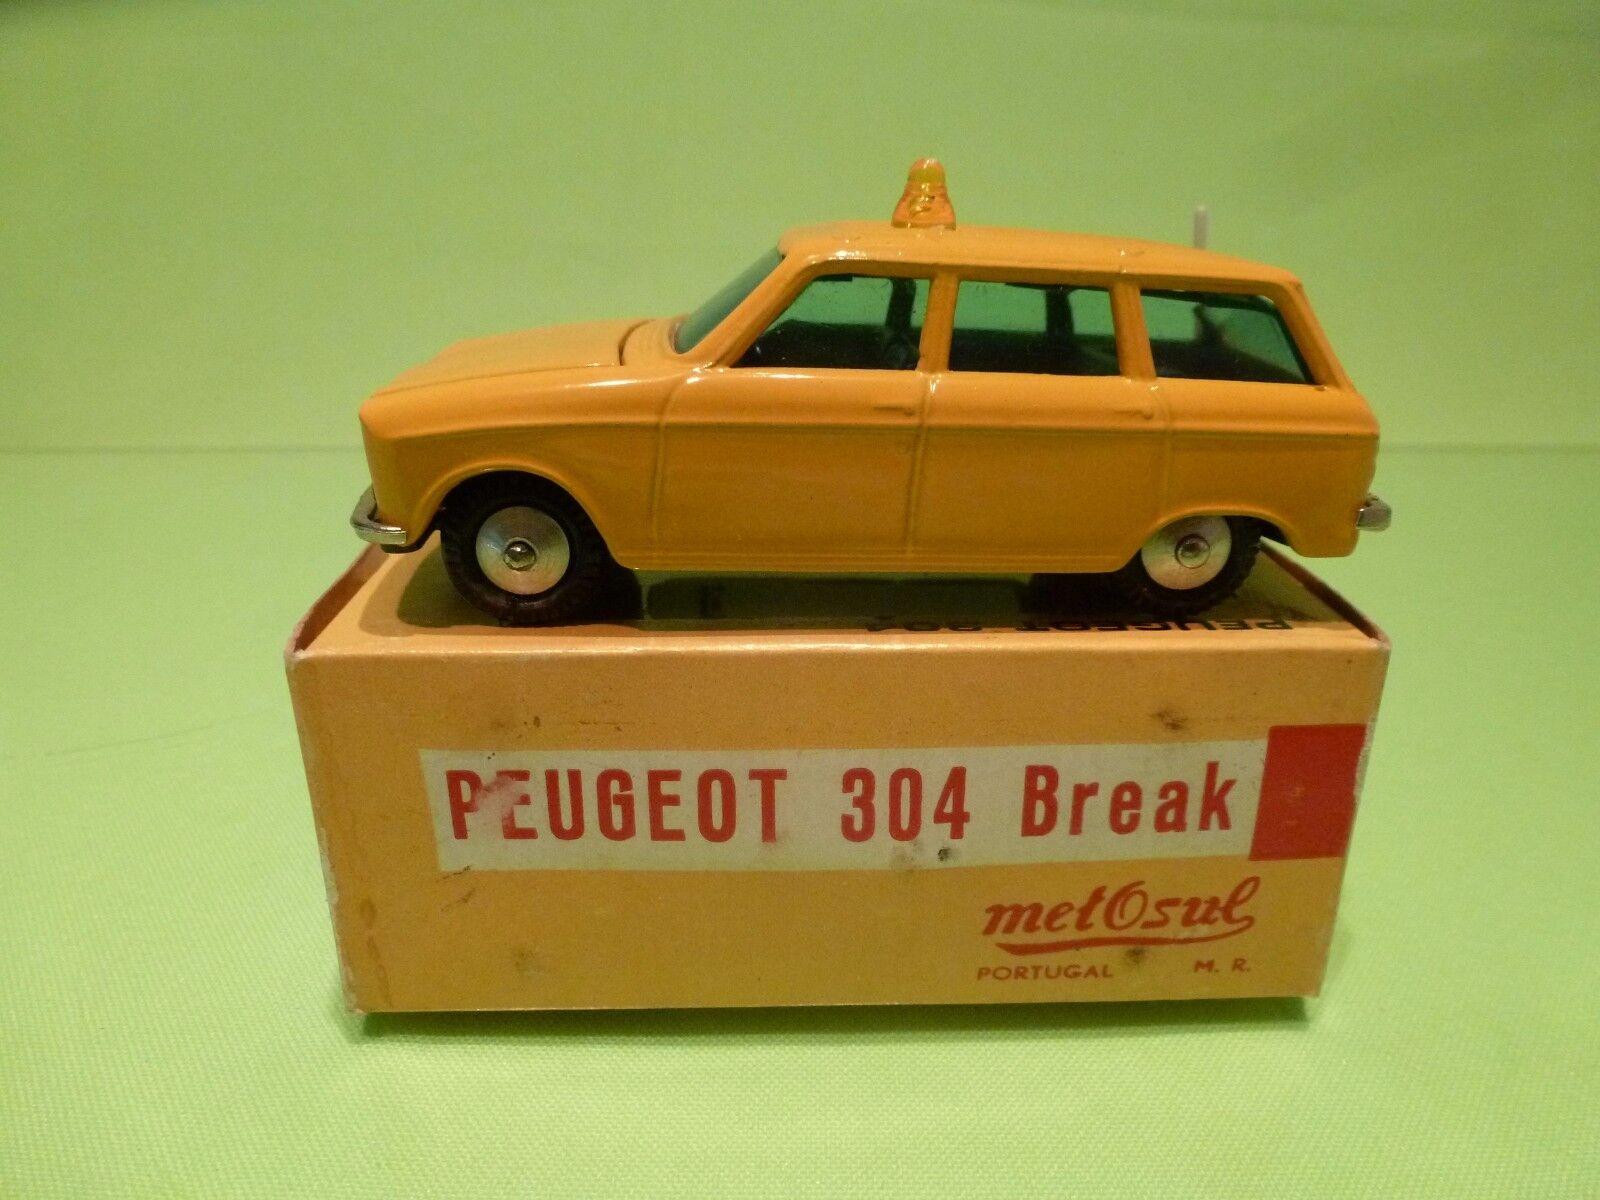 compras de moda online METOSUL PEUGEOT PEUGEOT PEUGEOT 304 BREAK - amarillo - EXCELLENT IN BOX  comprar barato